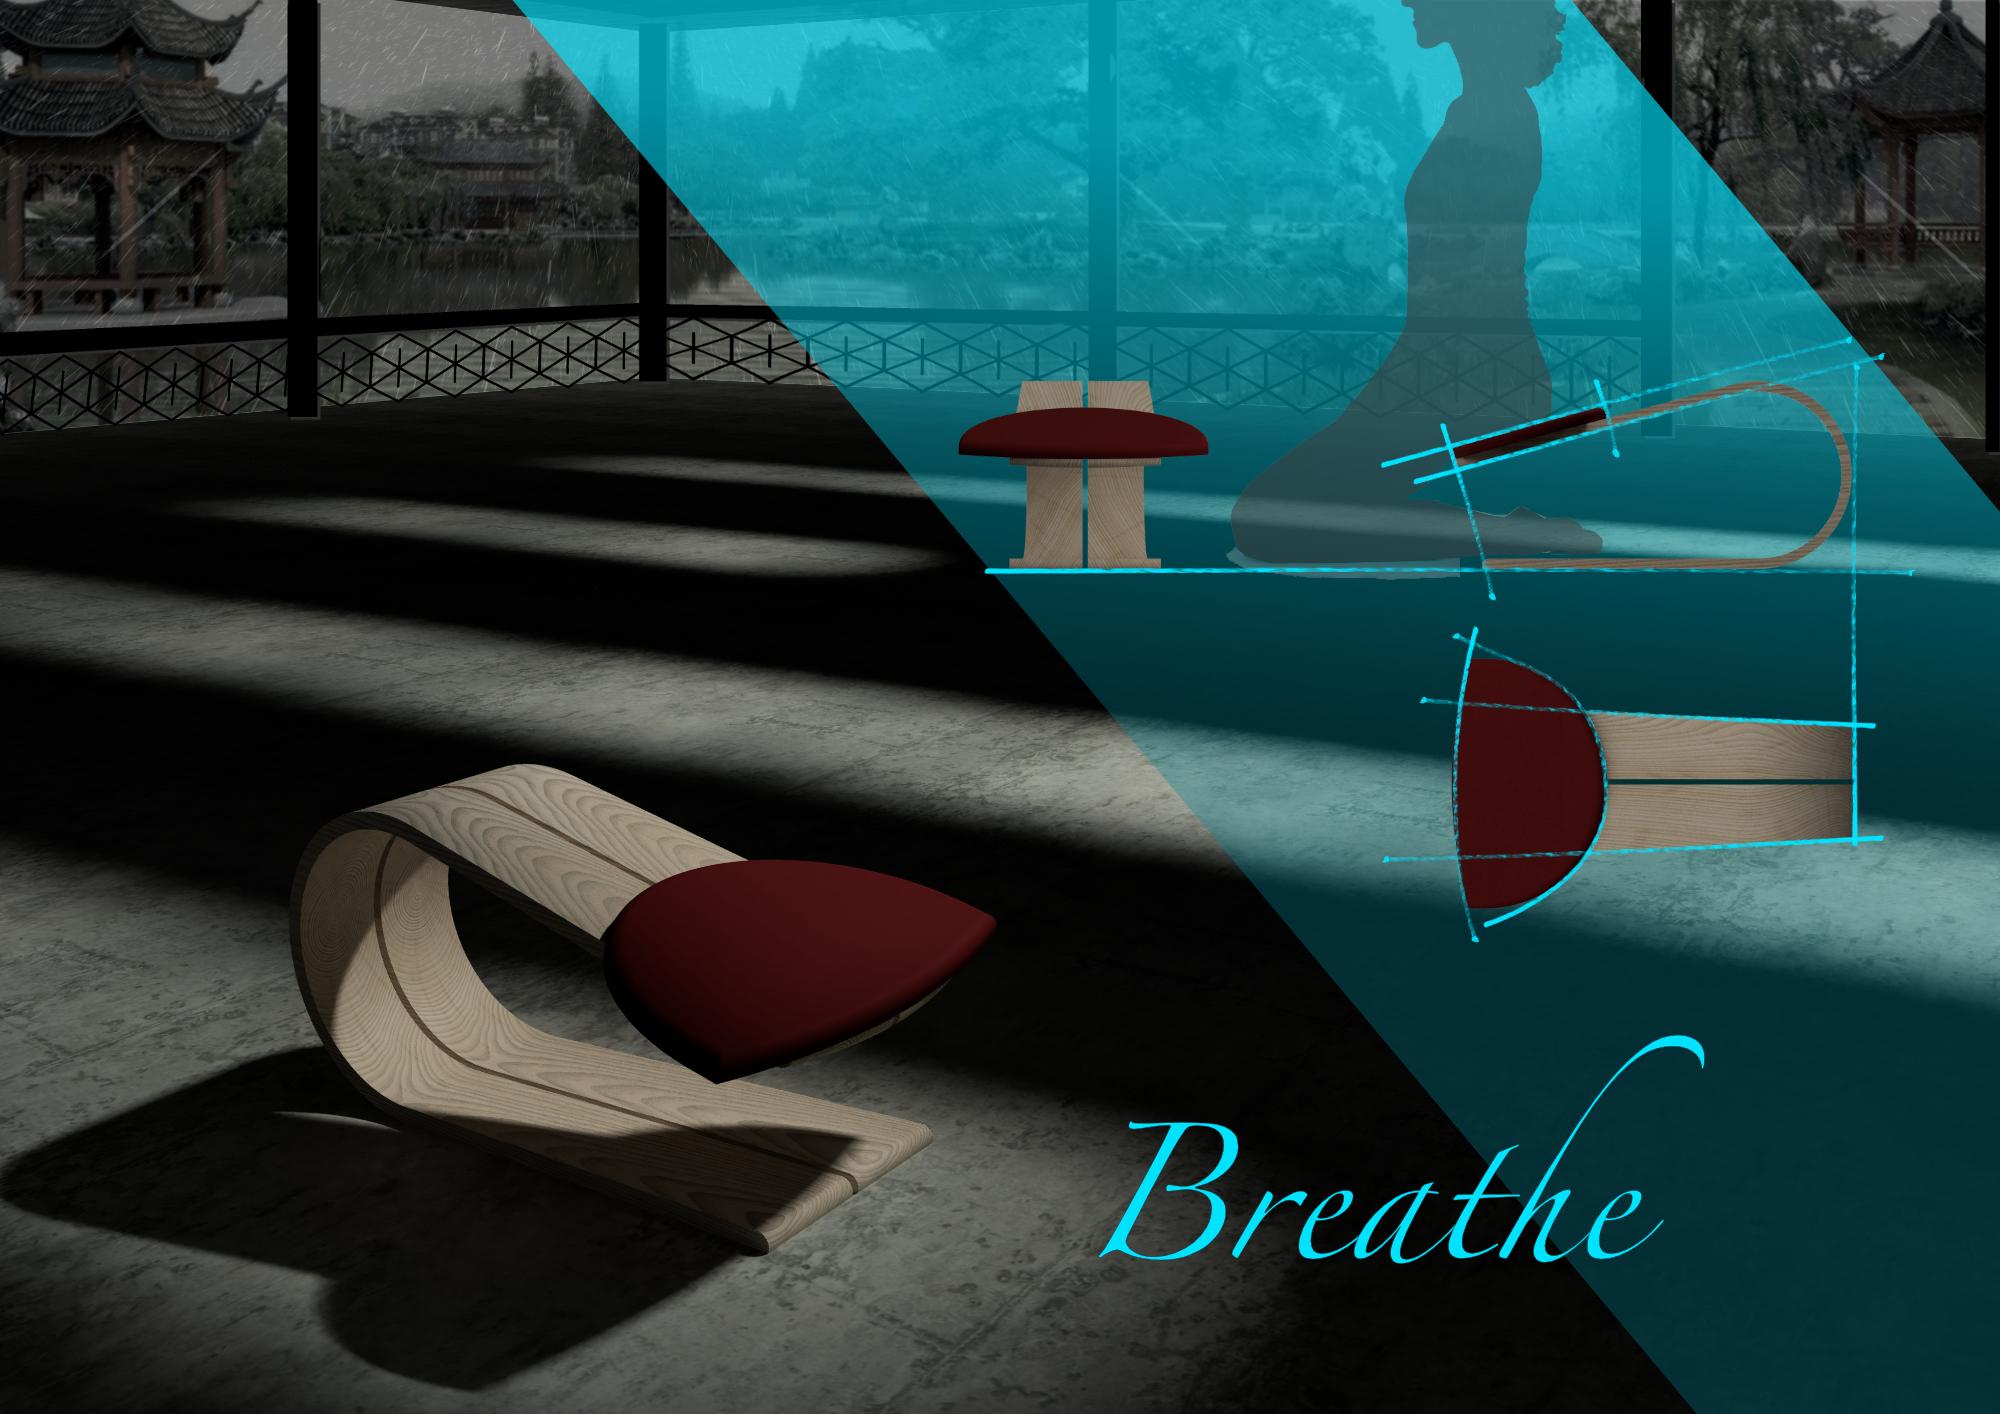 Nick Wright - Breathe